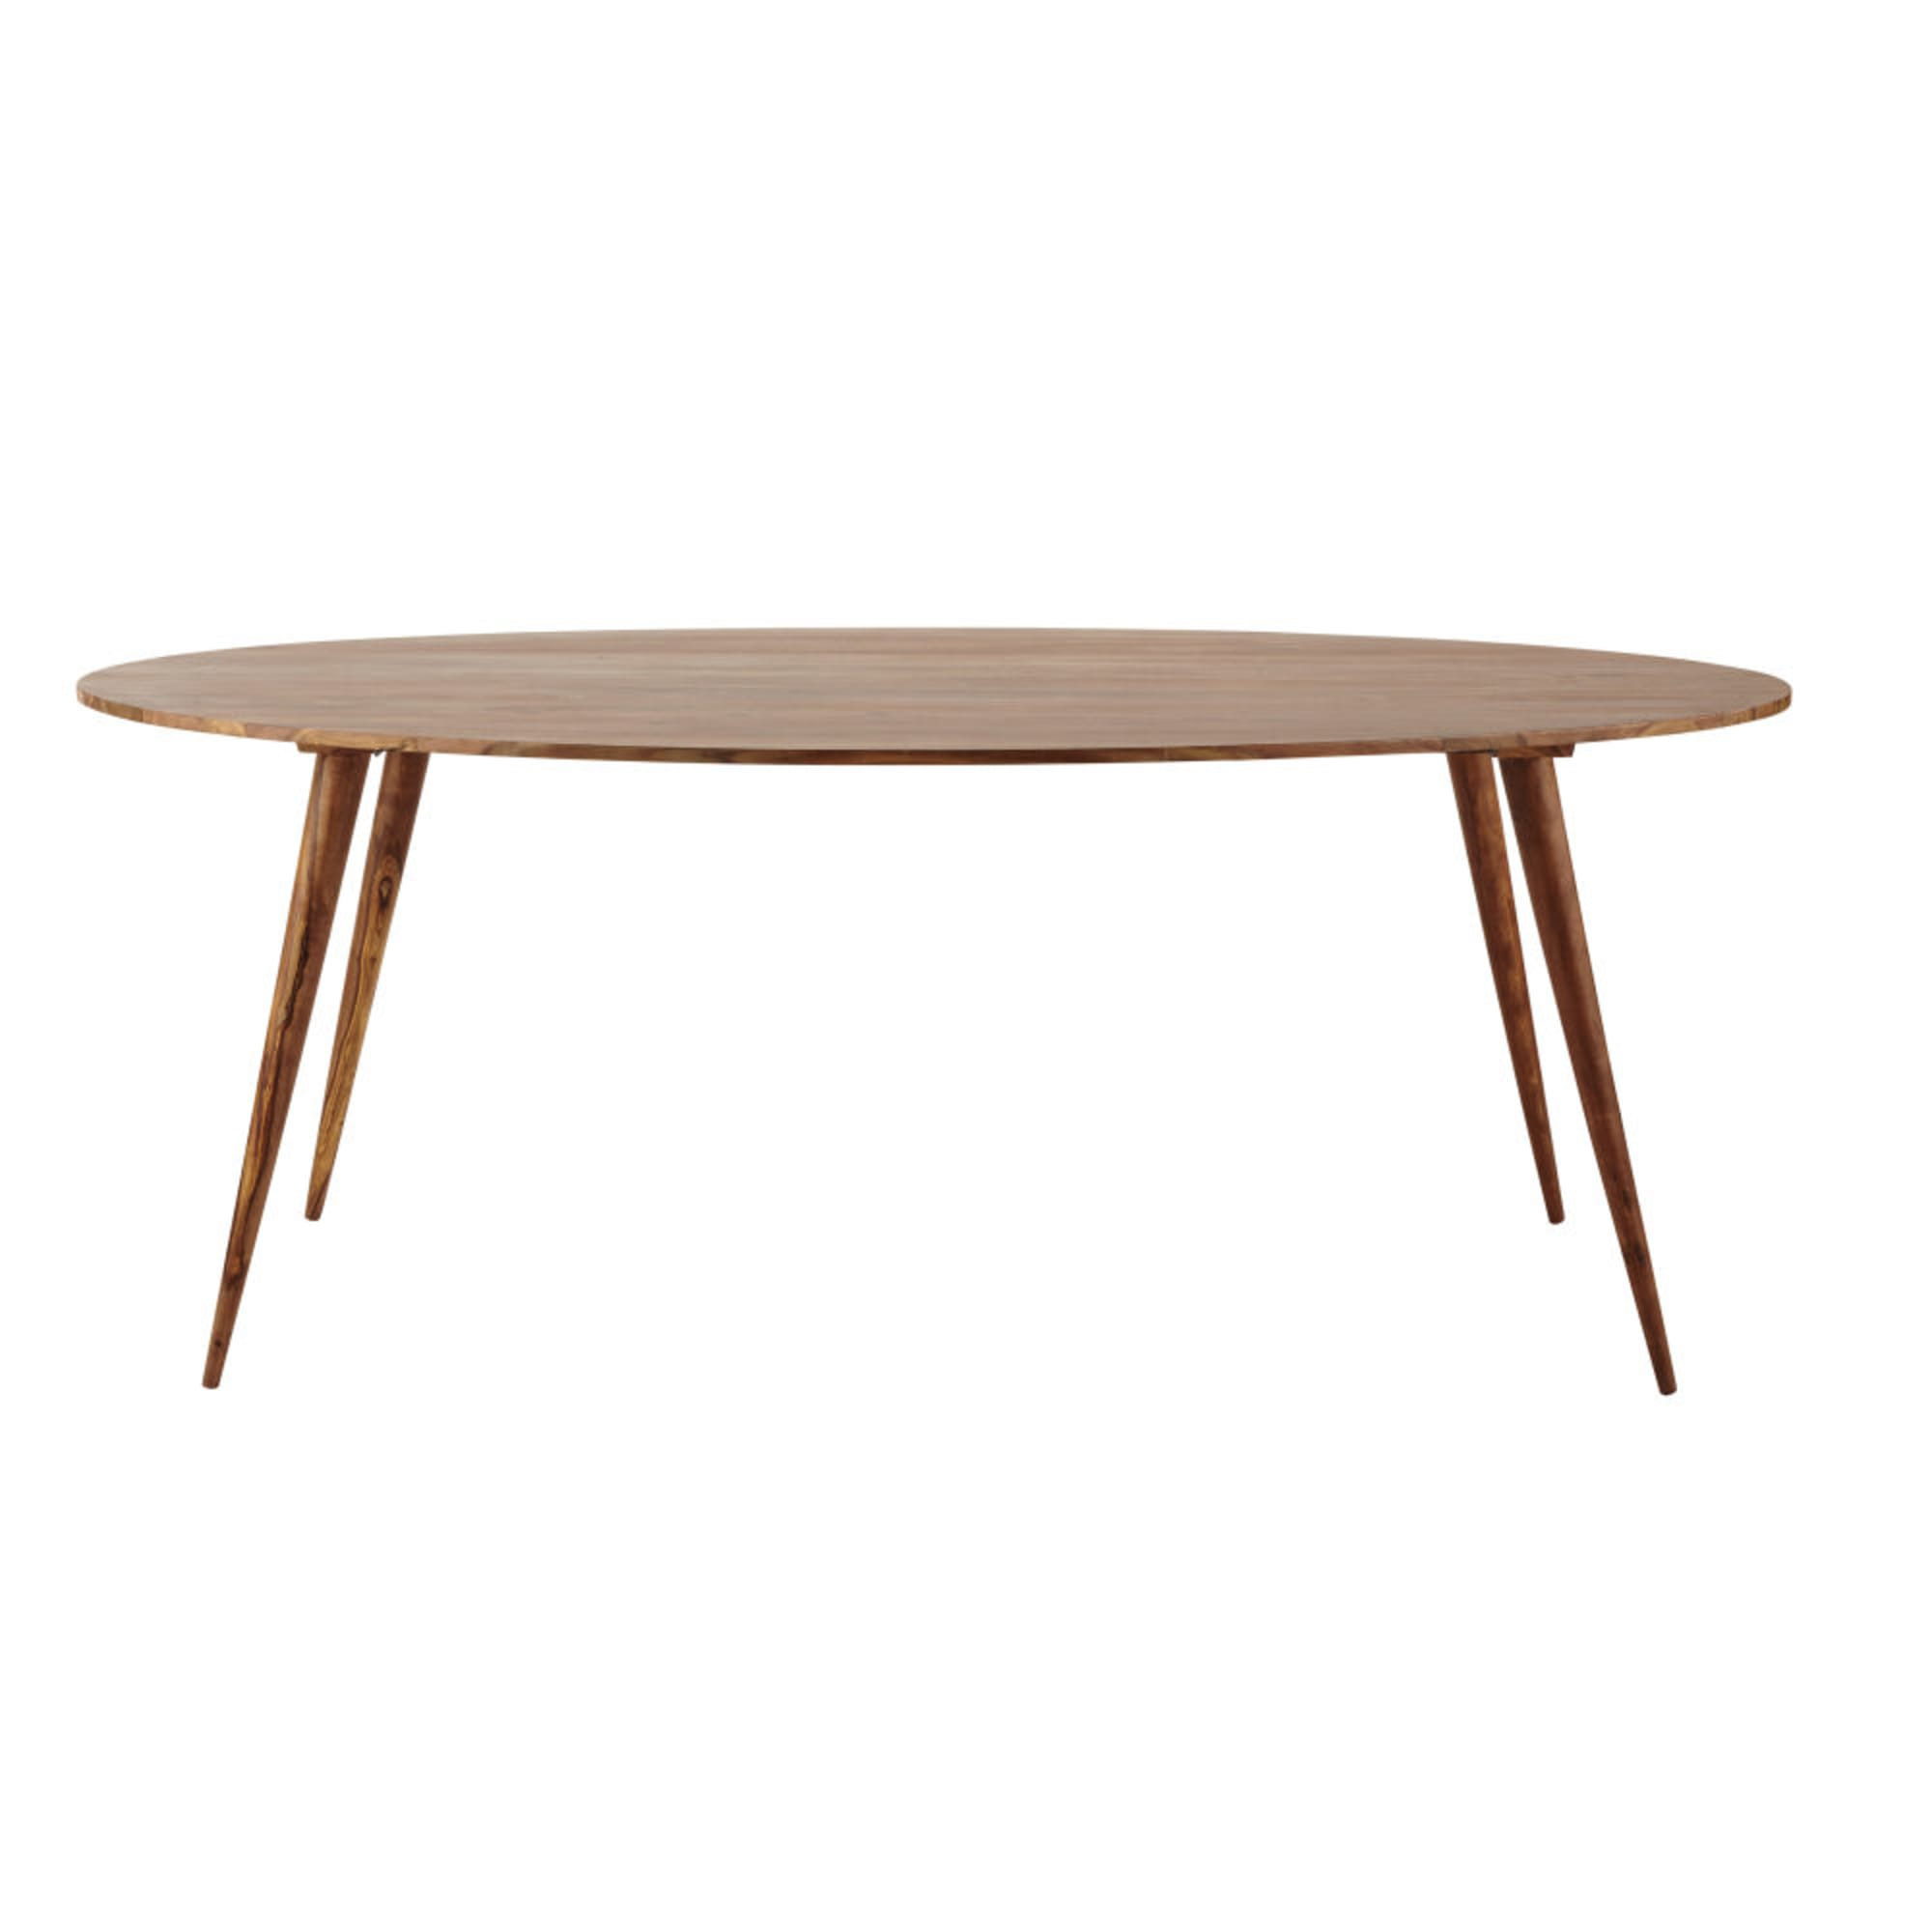 ANDERSEN.- Mesa de comedor ovalada de madera maciza de sisu L. 200